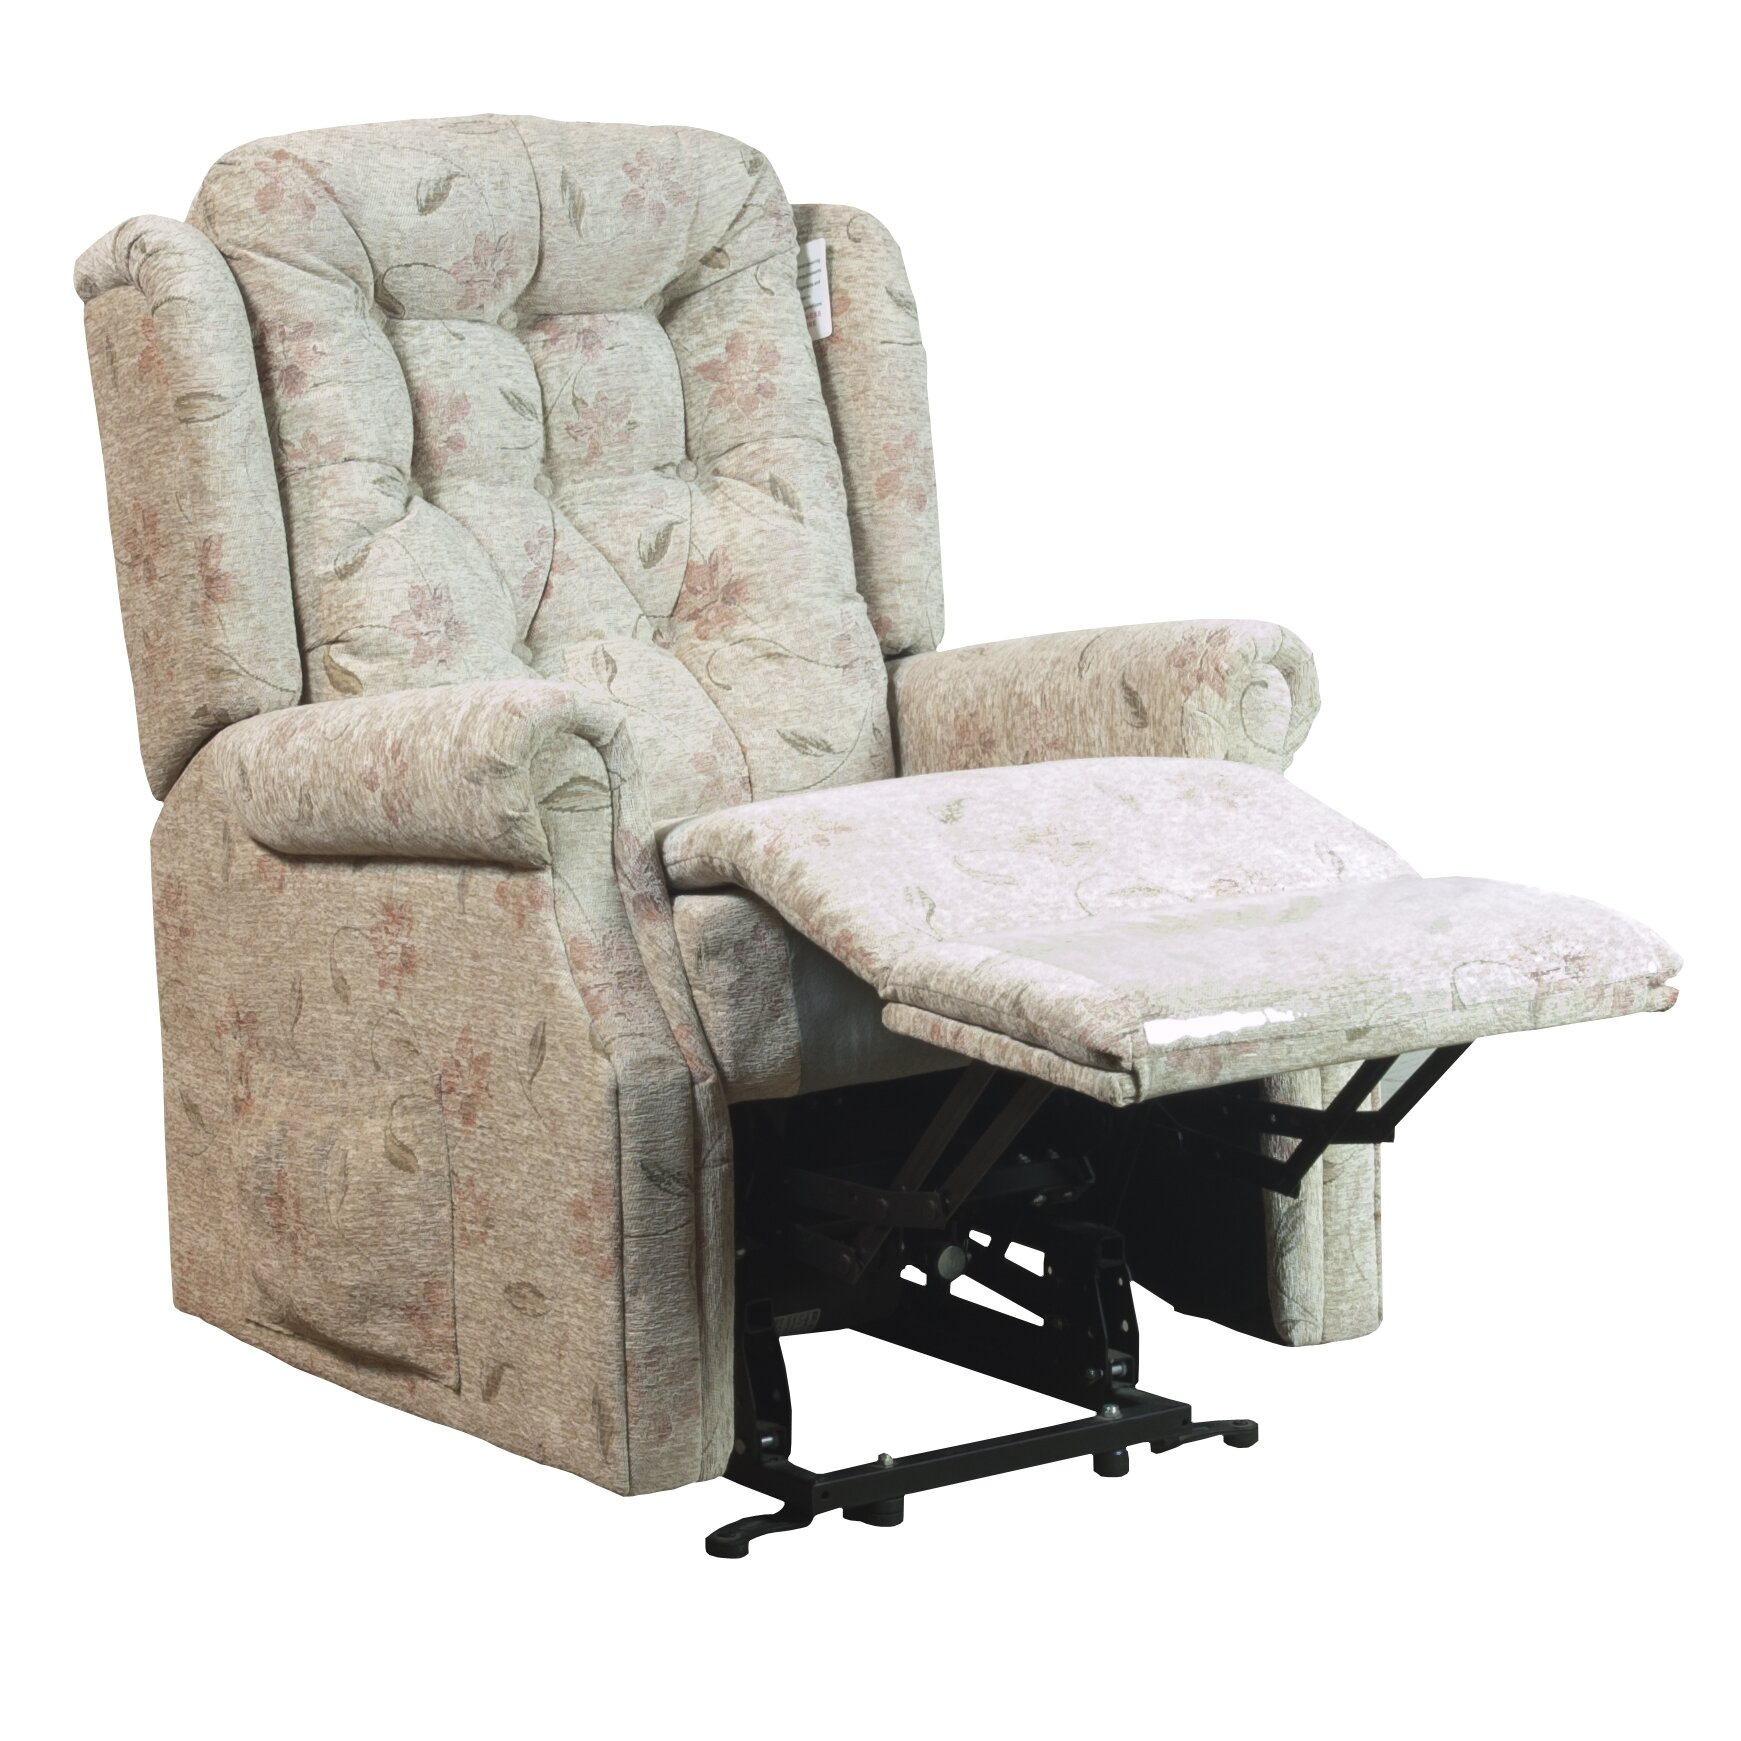 dcor design relaxsessel henderson. Black Bedroom Furniture Sets. Home Design Ideas